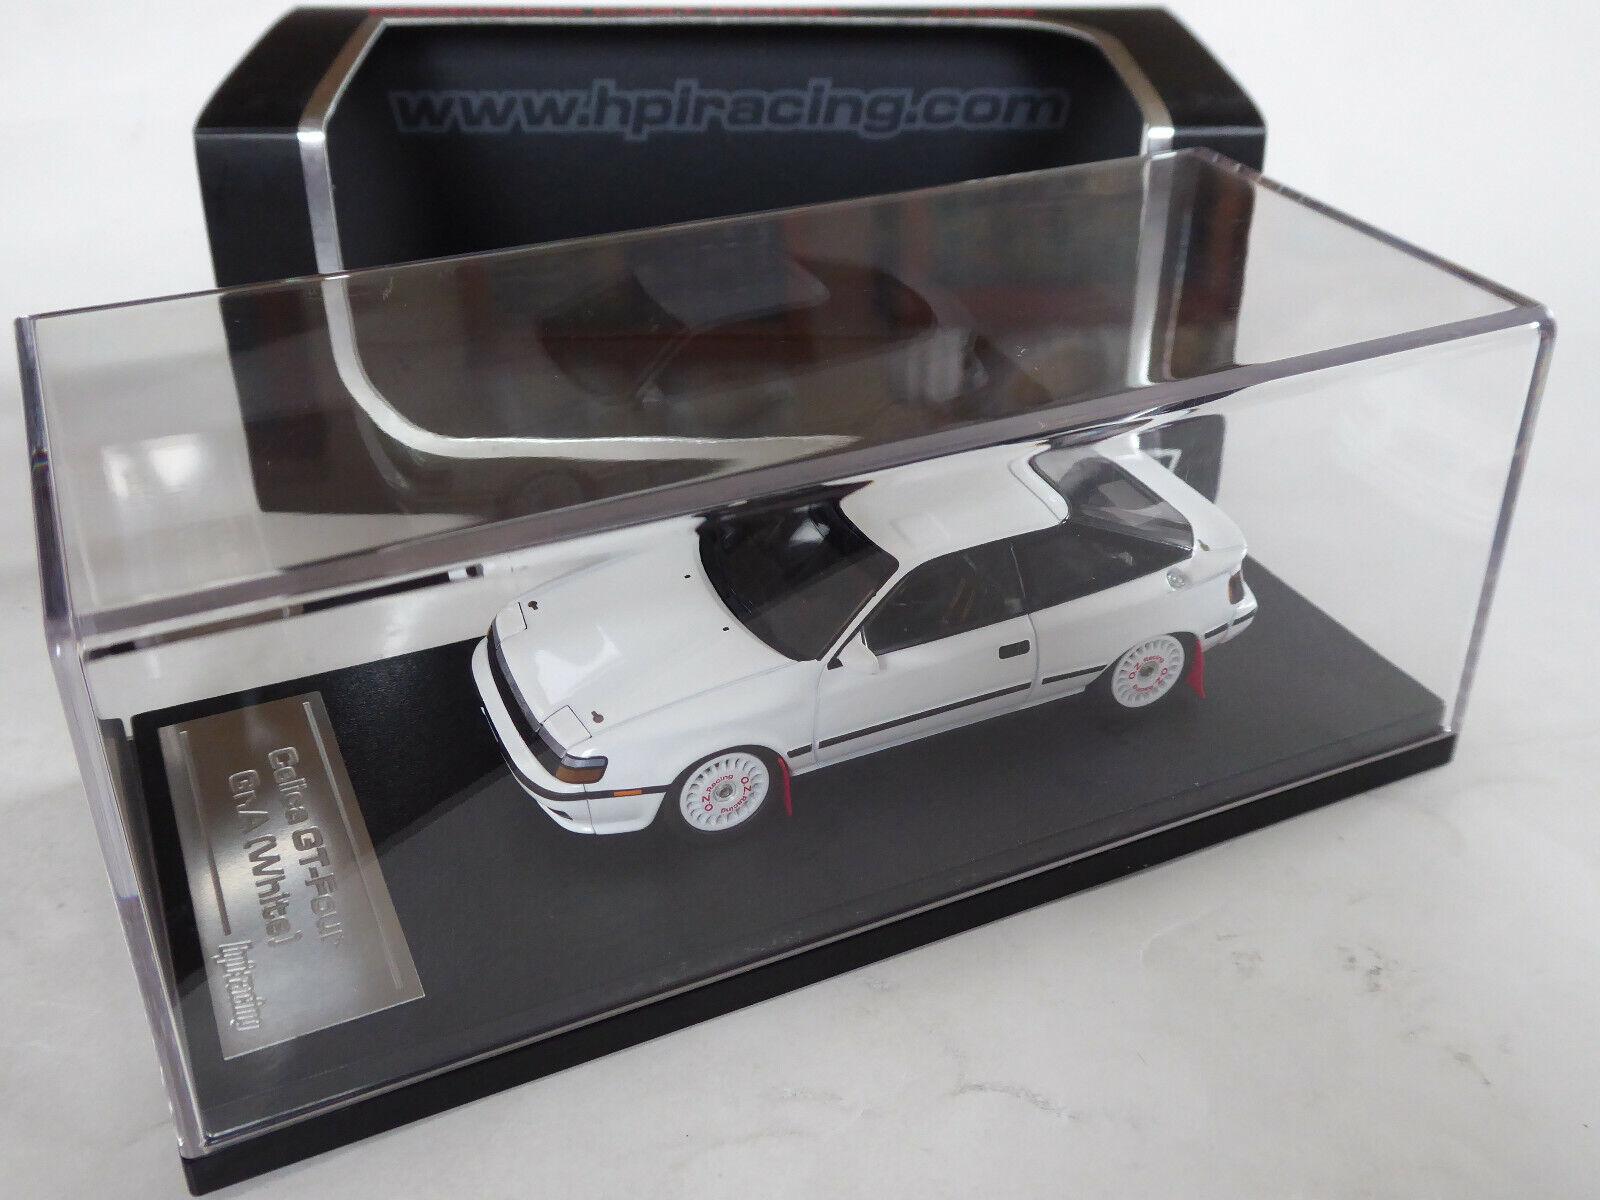 HPI 1 43 Toyota Celica GT-Four (ST165) Gr.A Rallye Test Car weiß Weiß OVP 8132  | Leicht zu reinigende Oberfläche